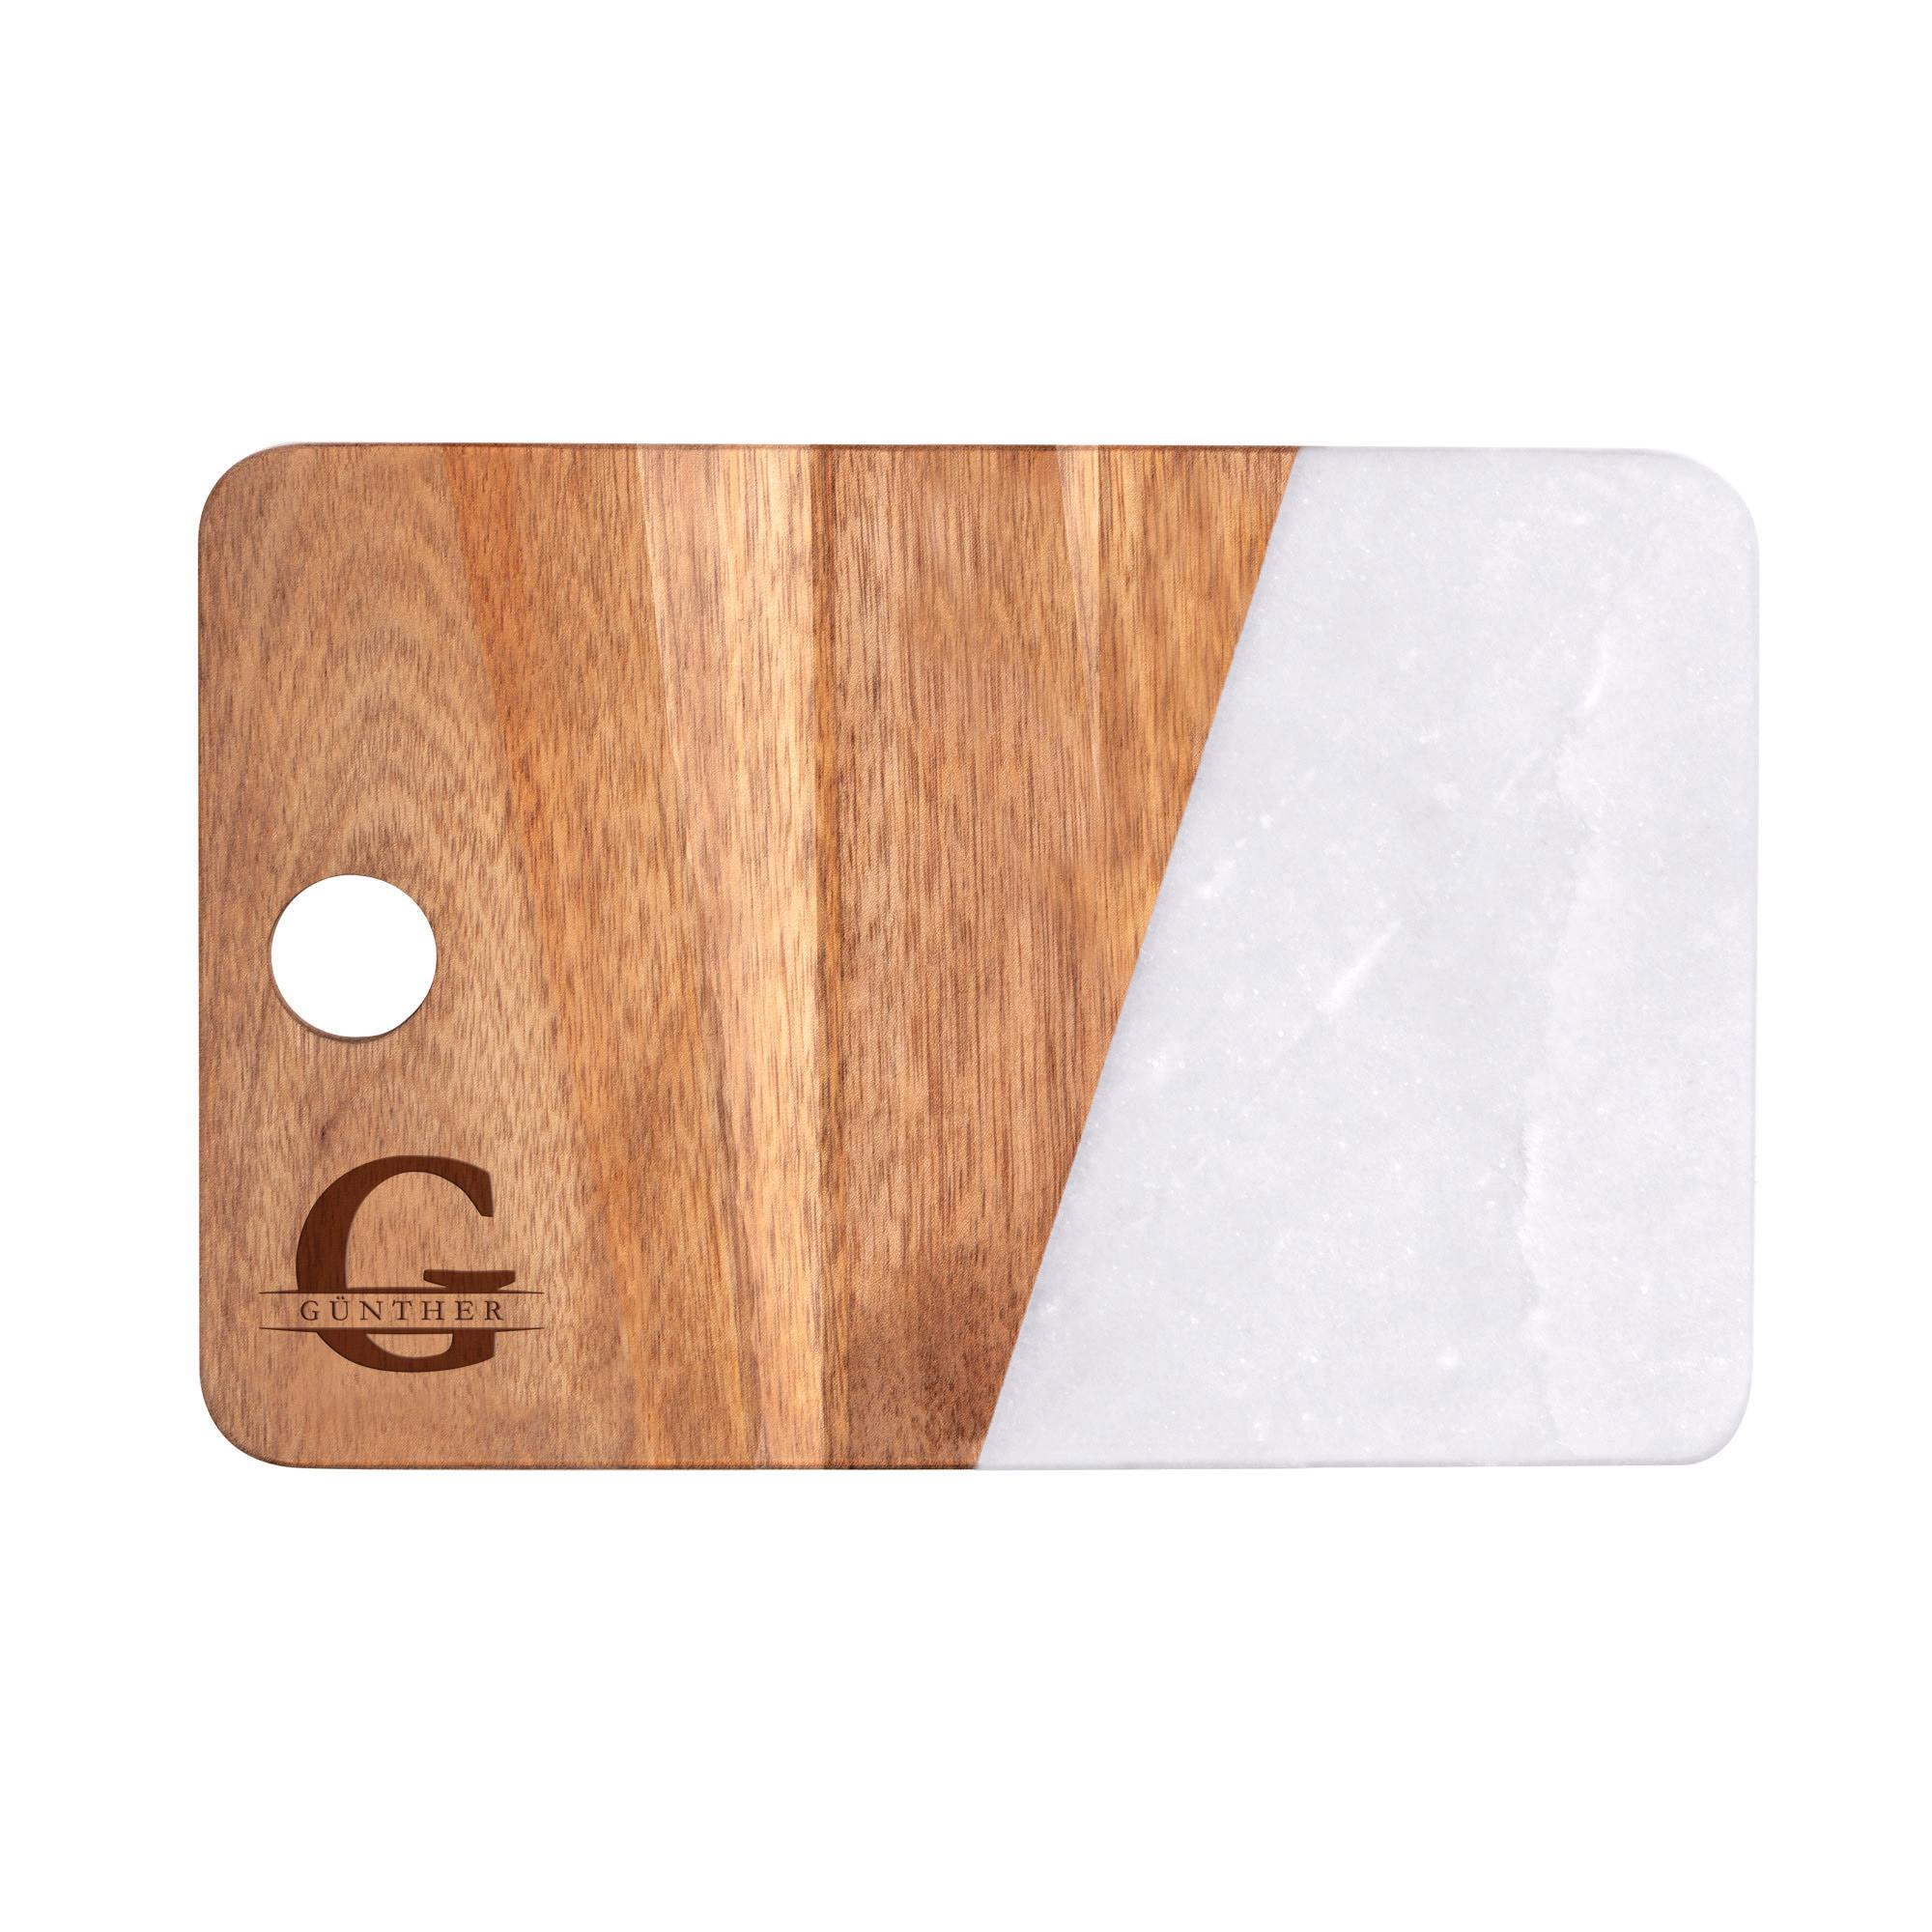 Servierbrett Marmor mit personalisierte Gravur - Initial